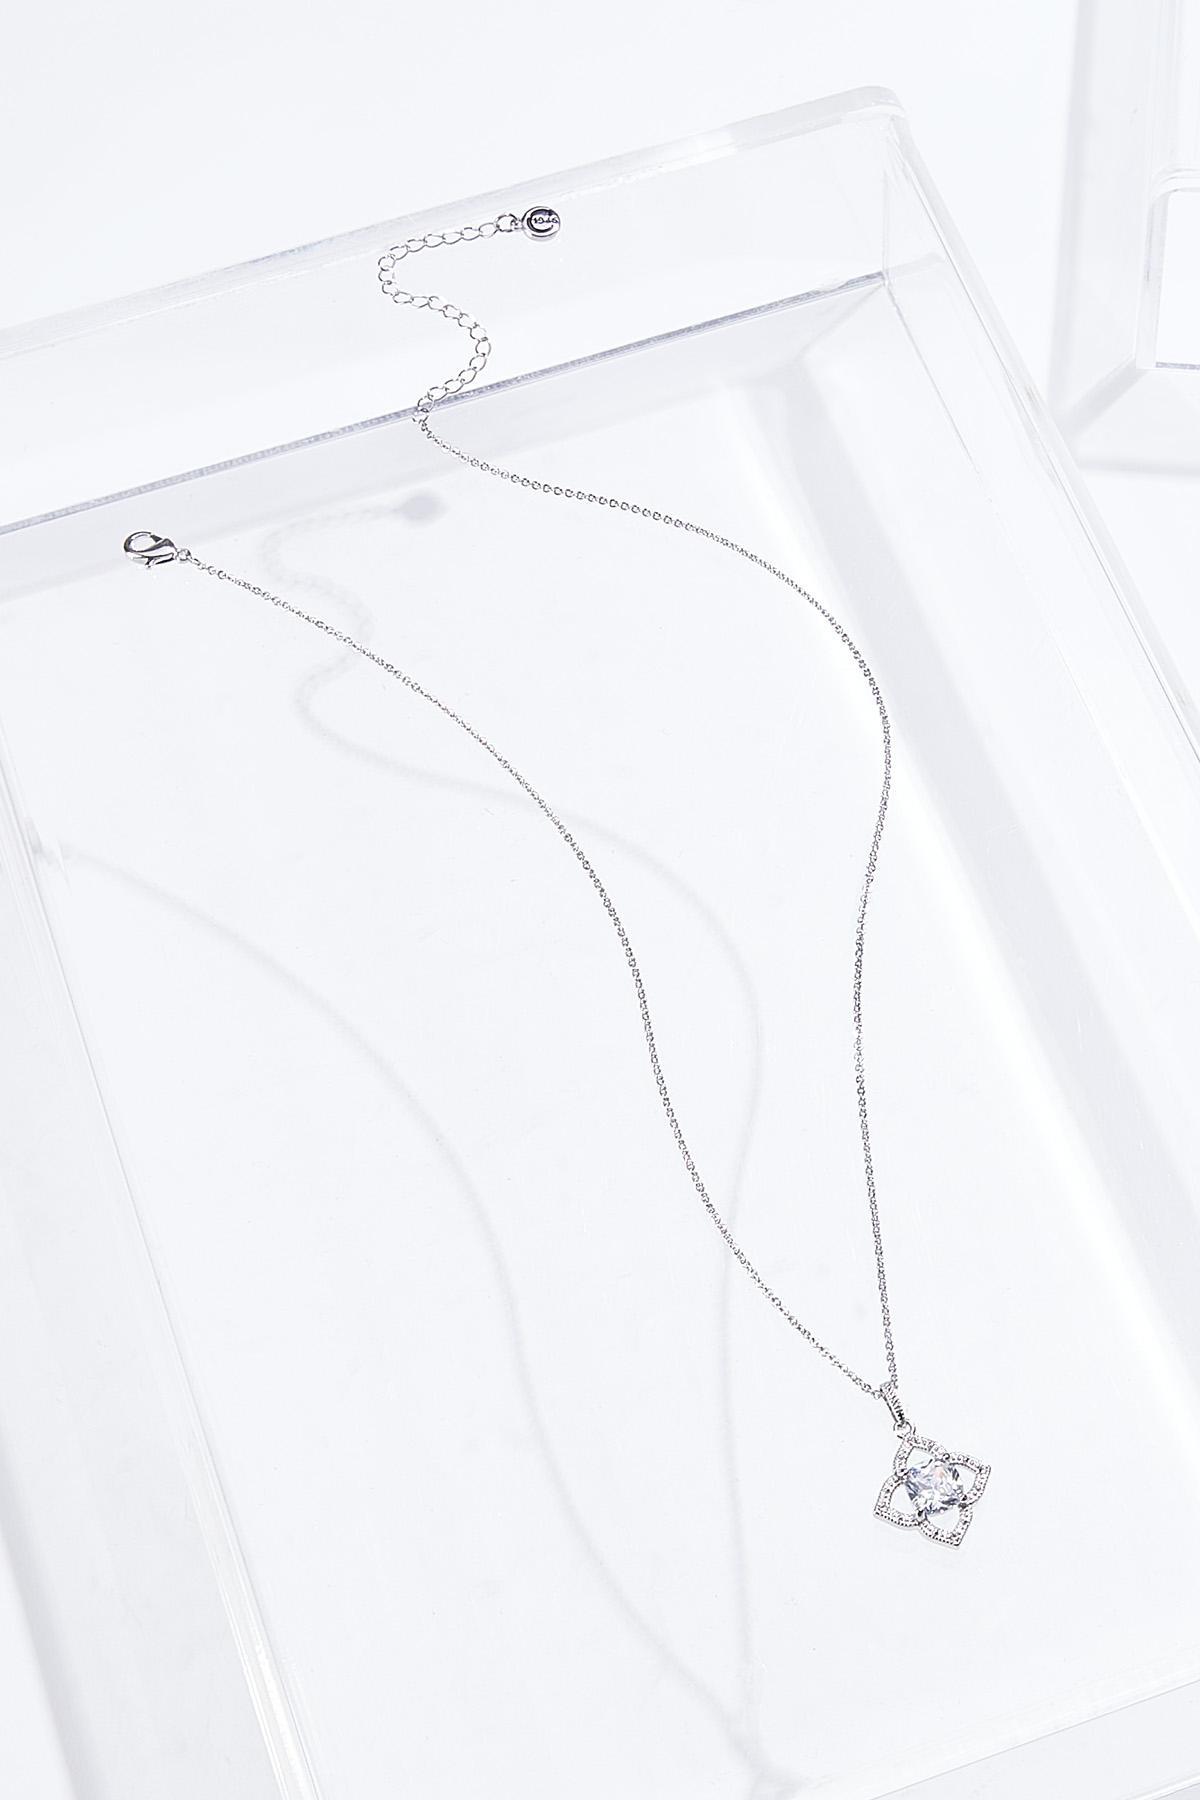 Cushion Cut Clover Necklace